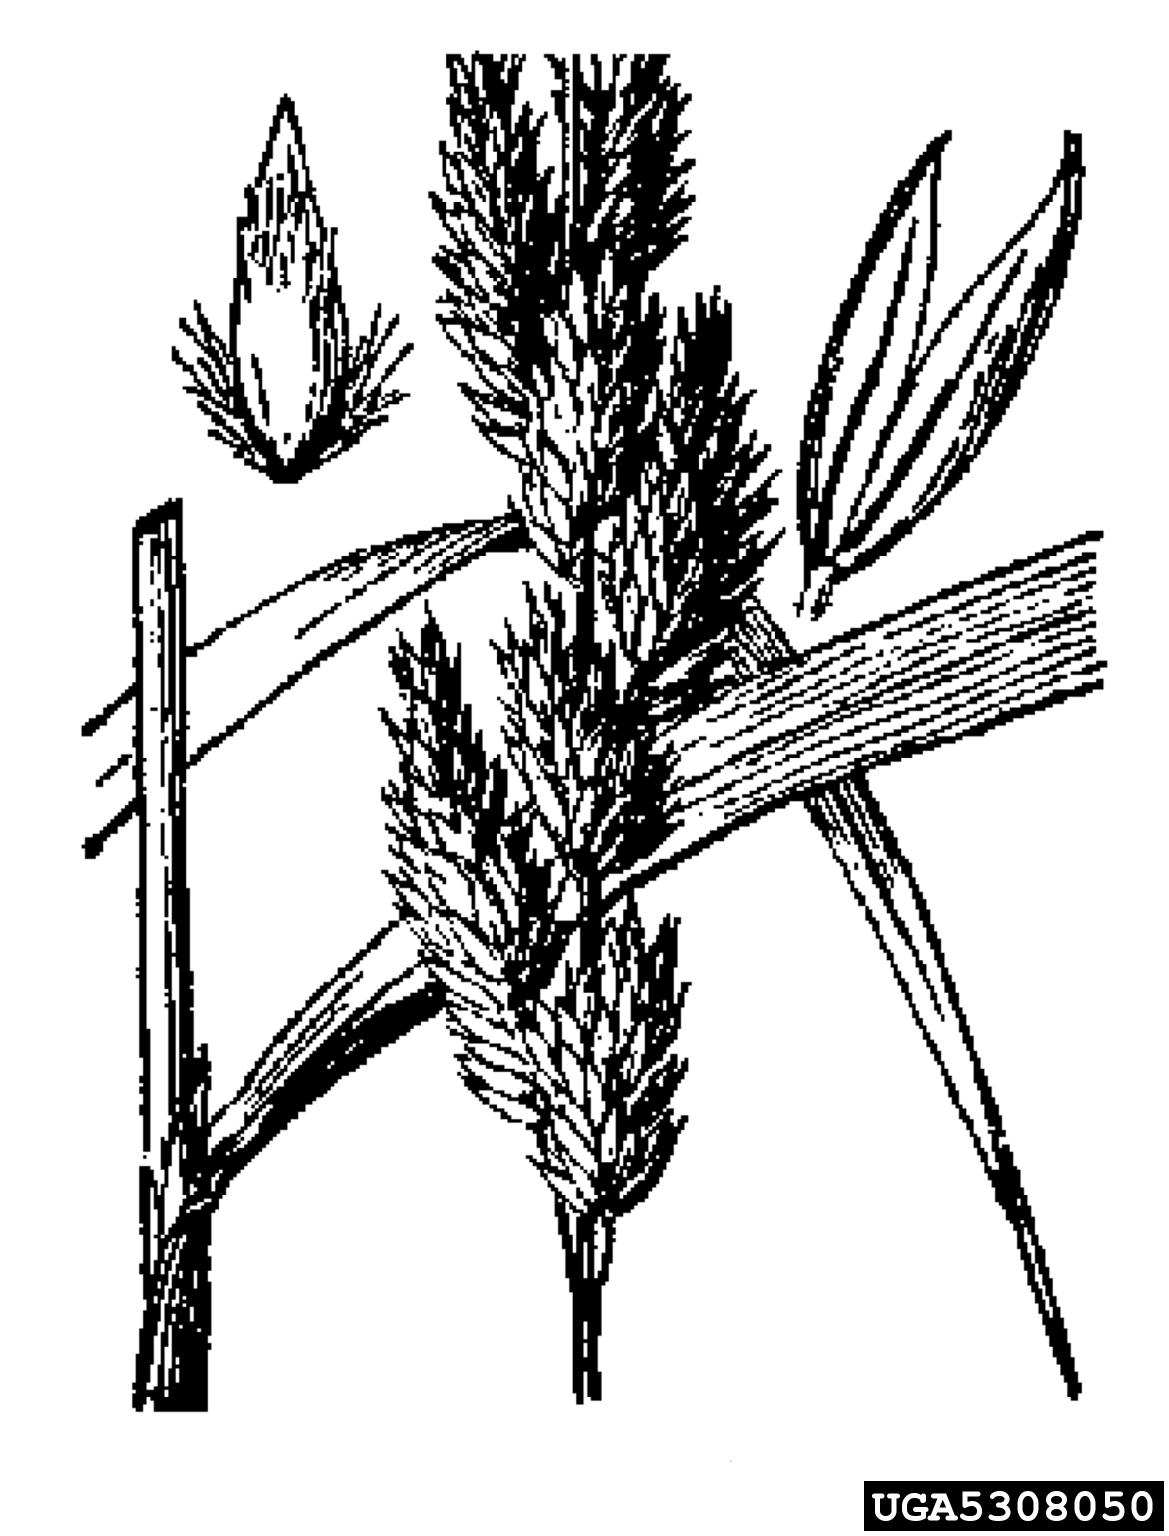 reed canarygrass: Phalaris arundinacea (Cyperales: Poaceae)